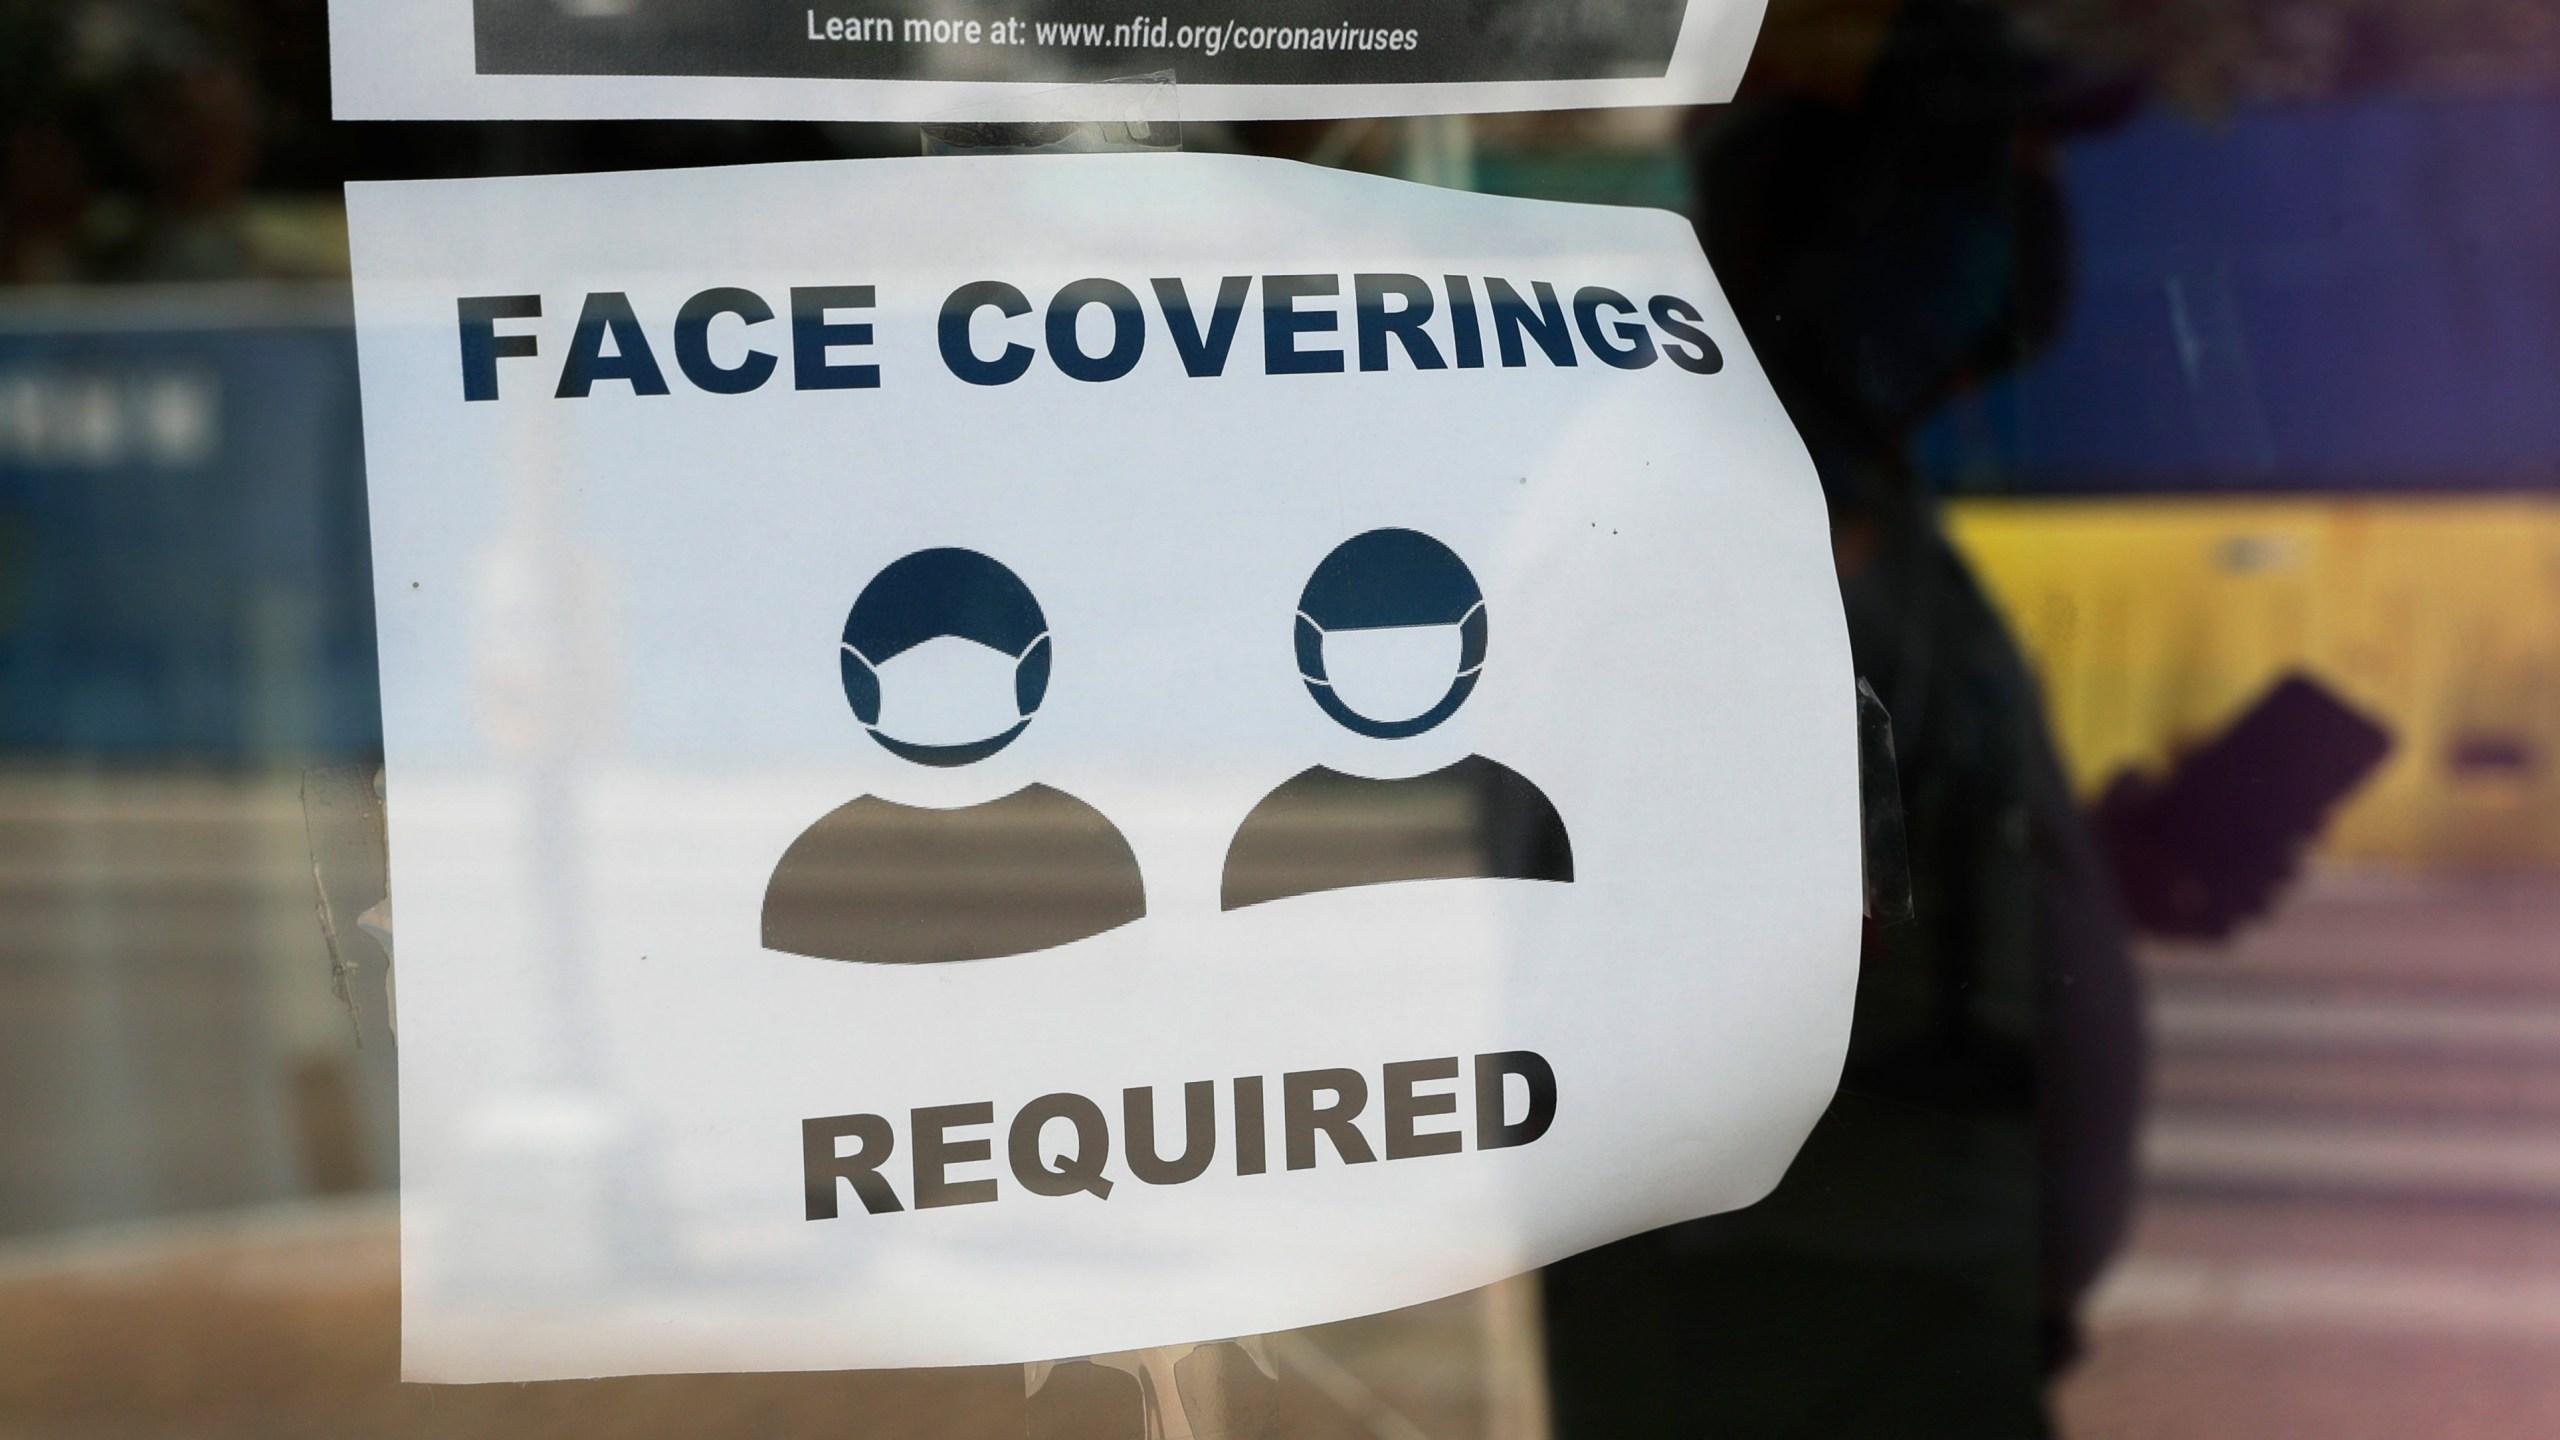 Virus Face mask sign